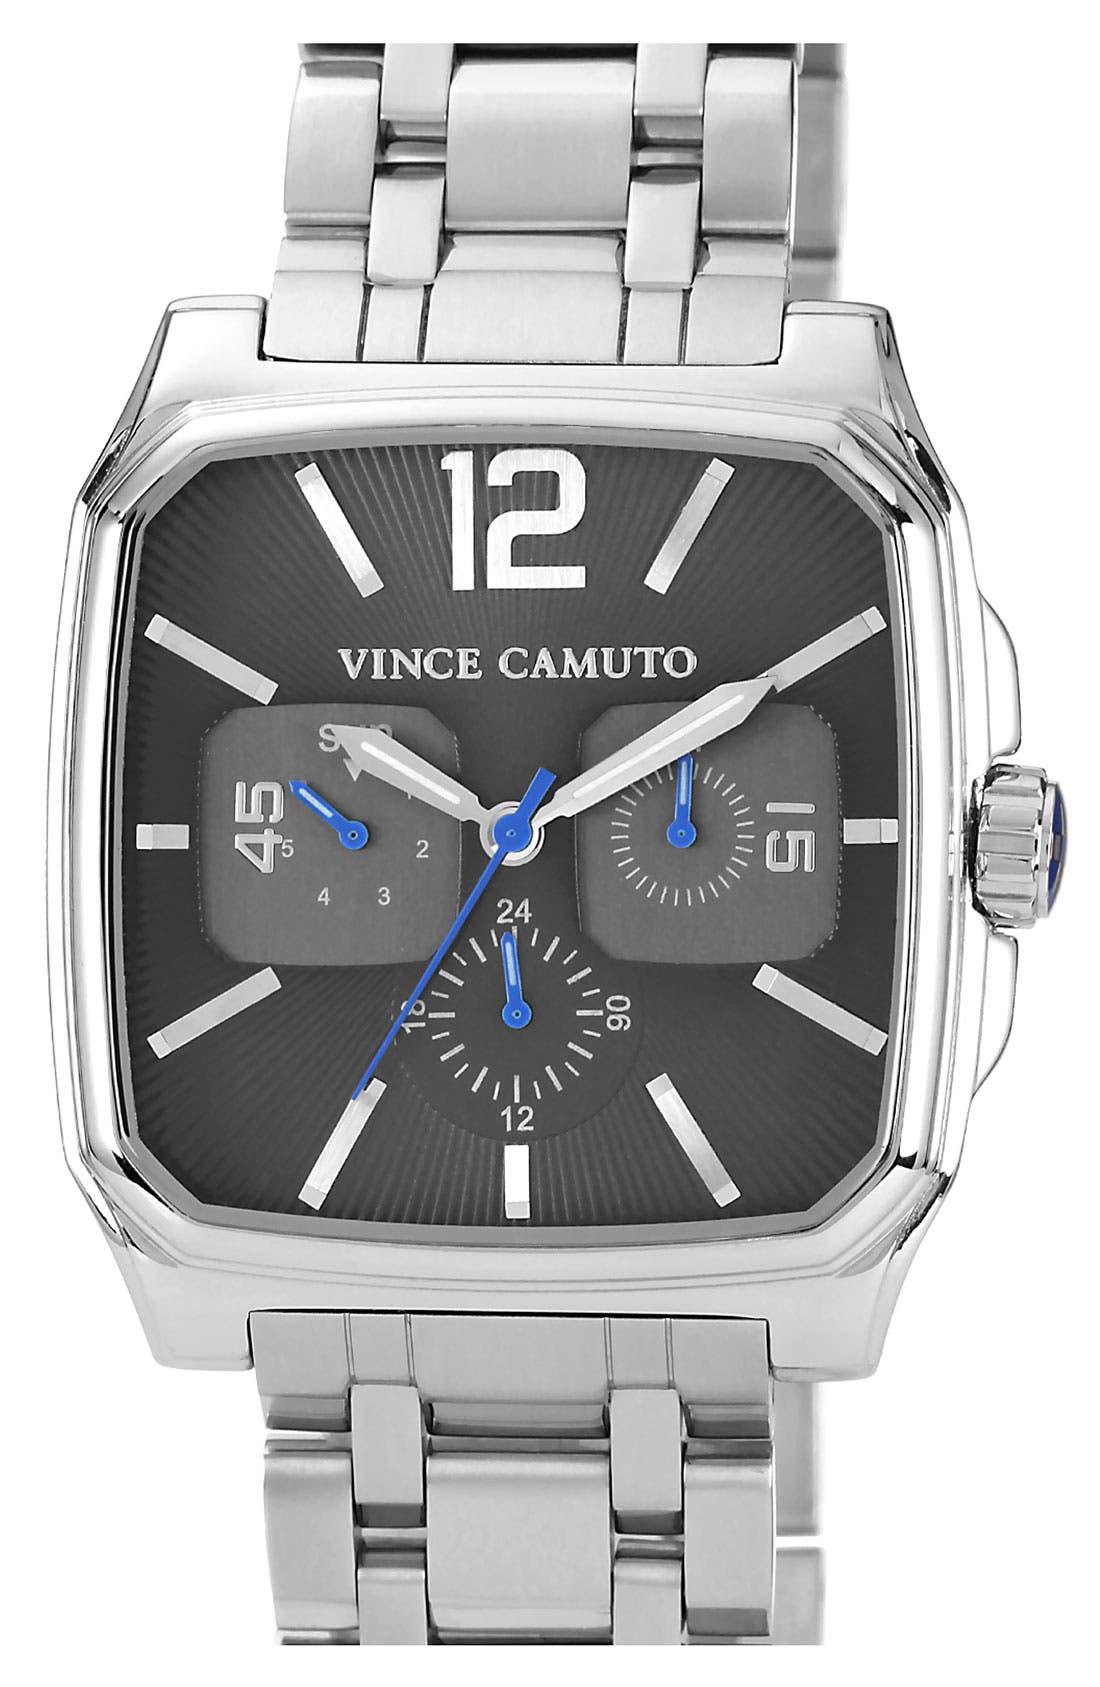 Main Image - Vince Camuto 'Sergeant' Square Bracelet Watch, 40mm x 46mm